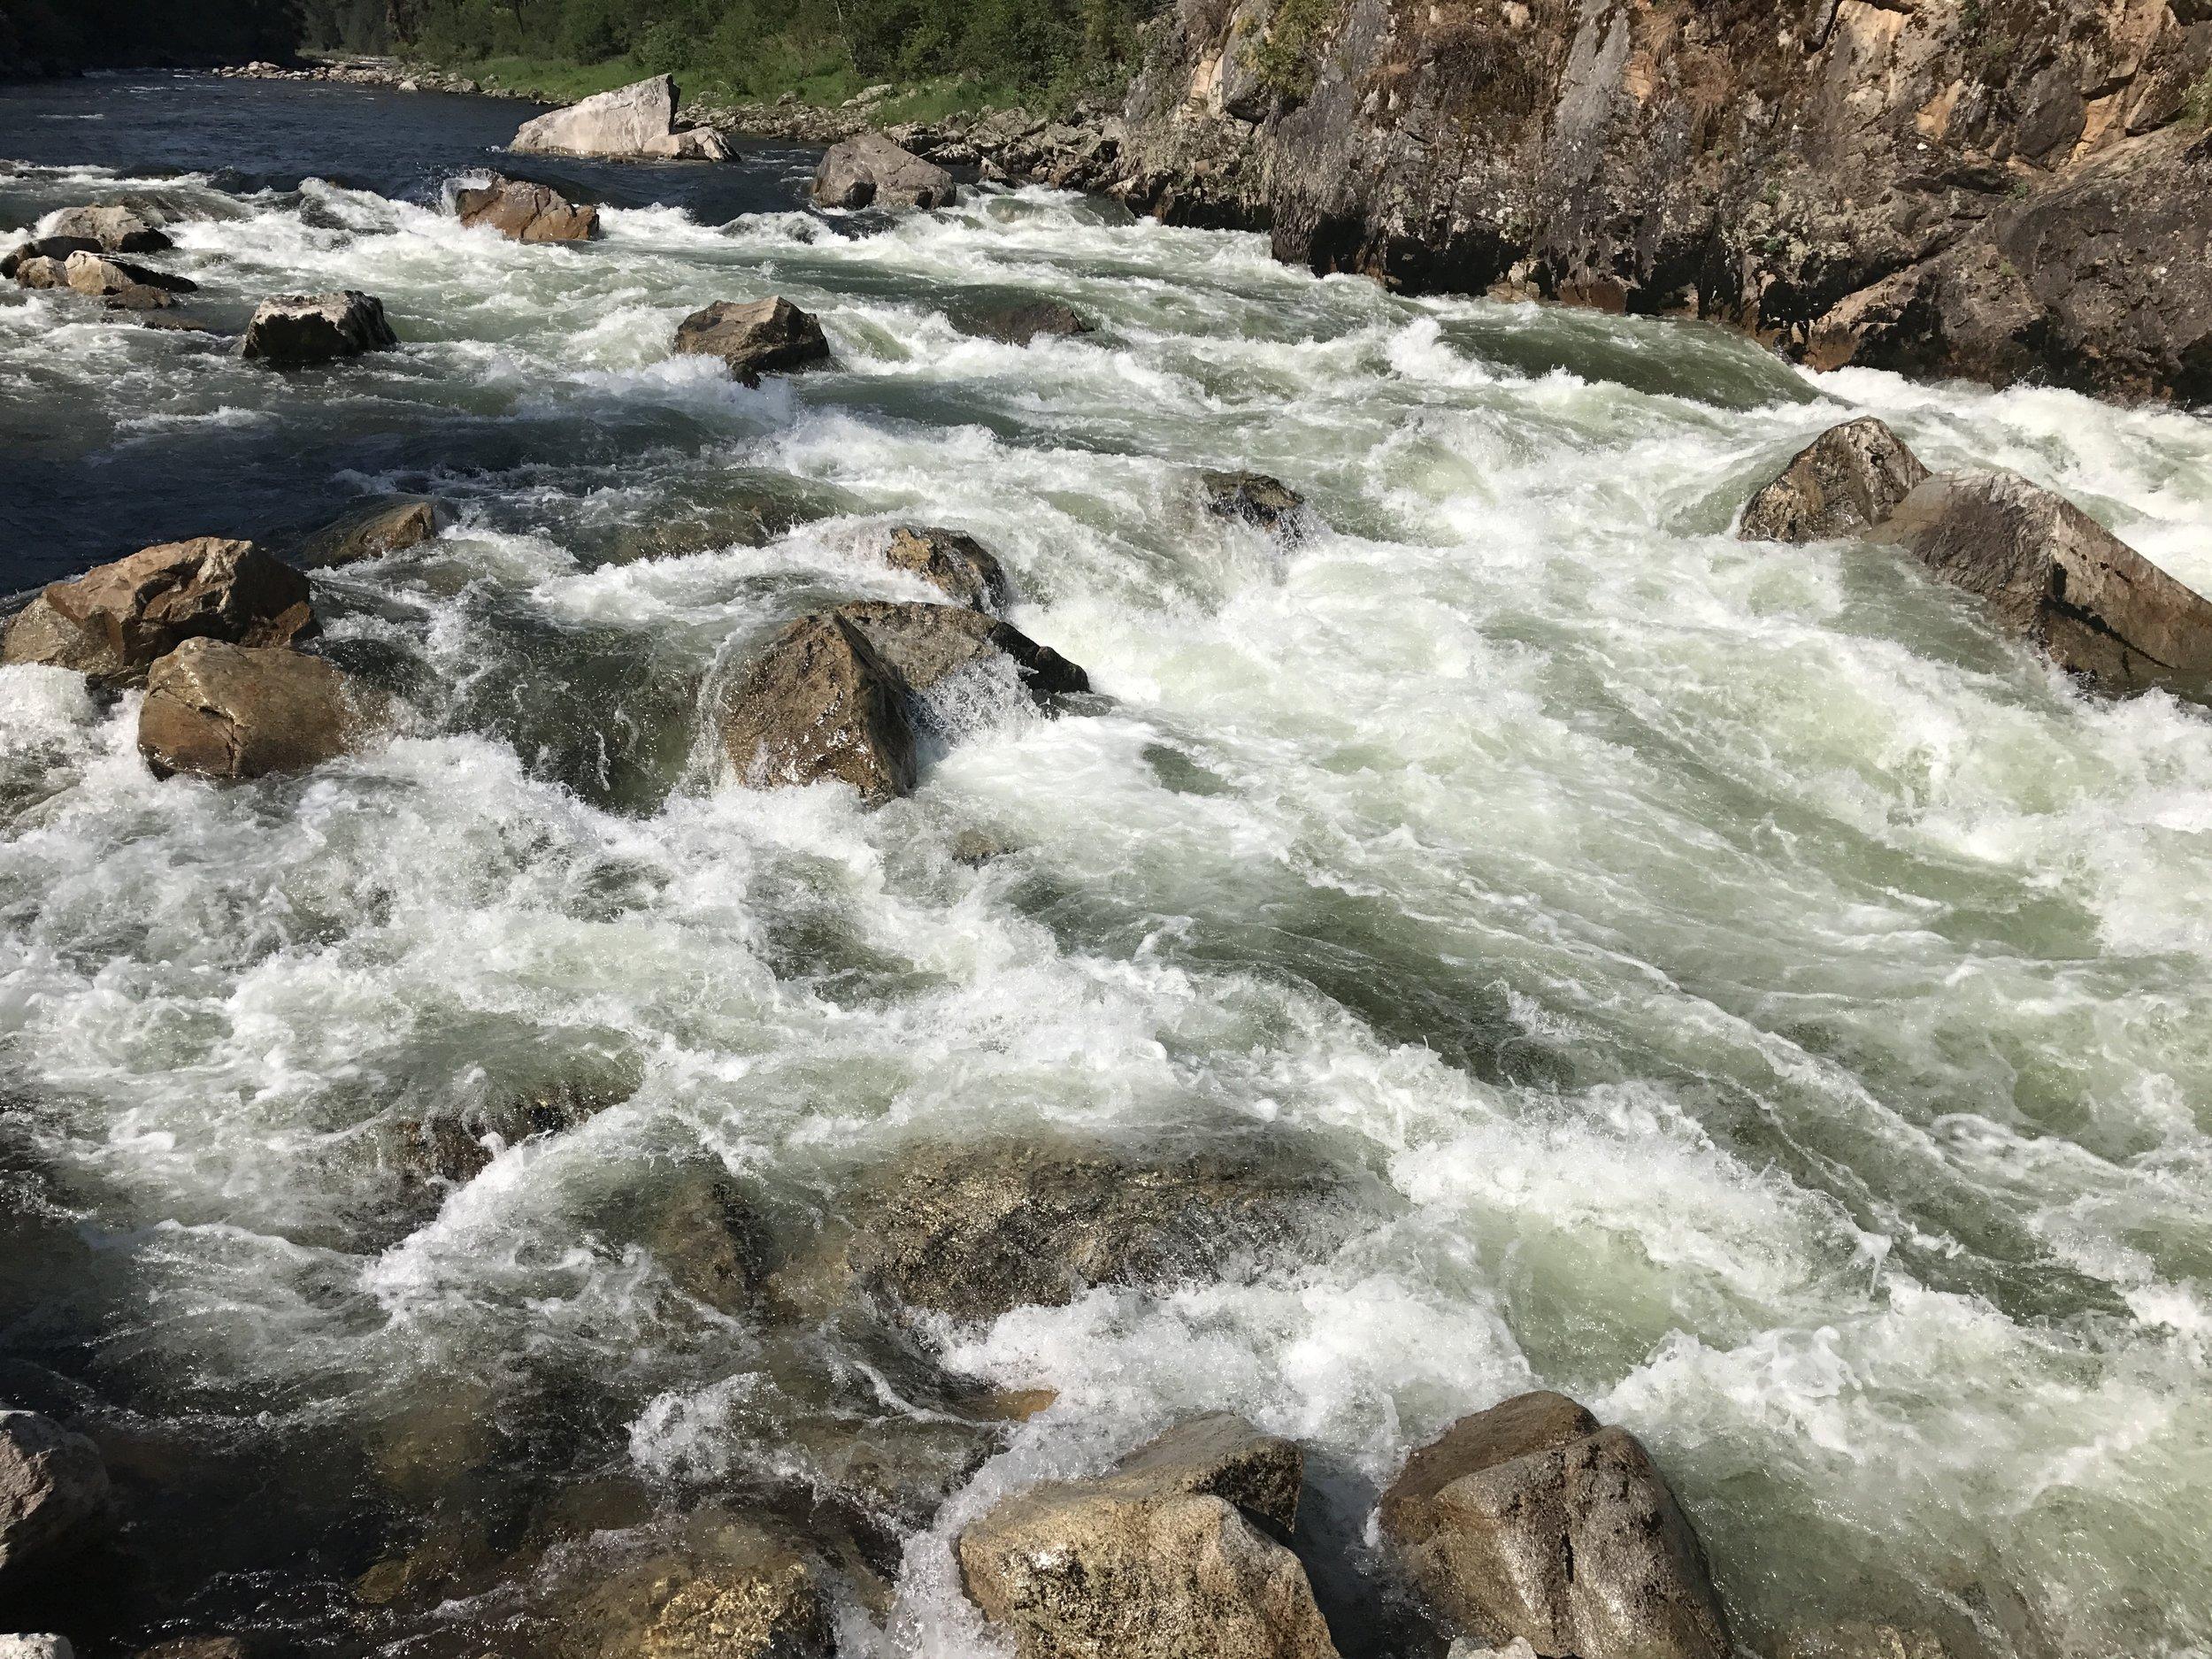 South Fork Salmon River whitewater  @Nate Ostis